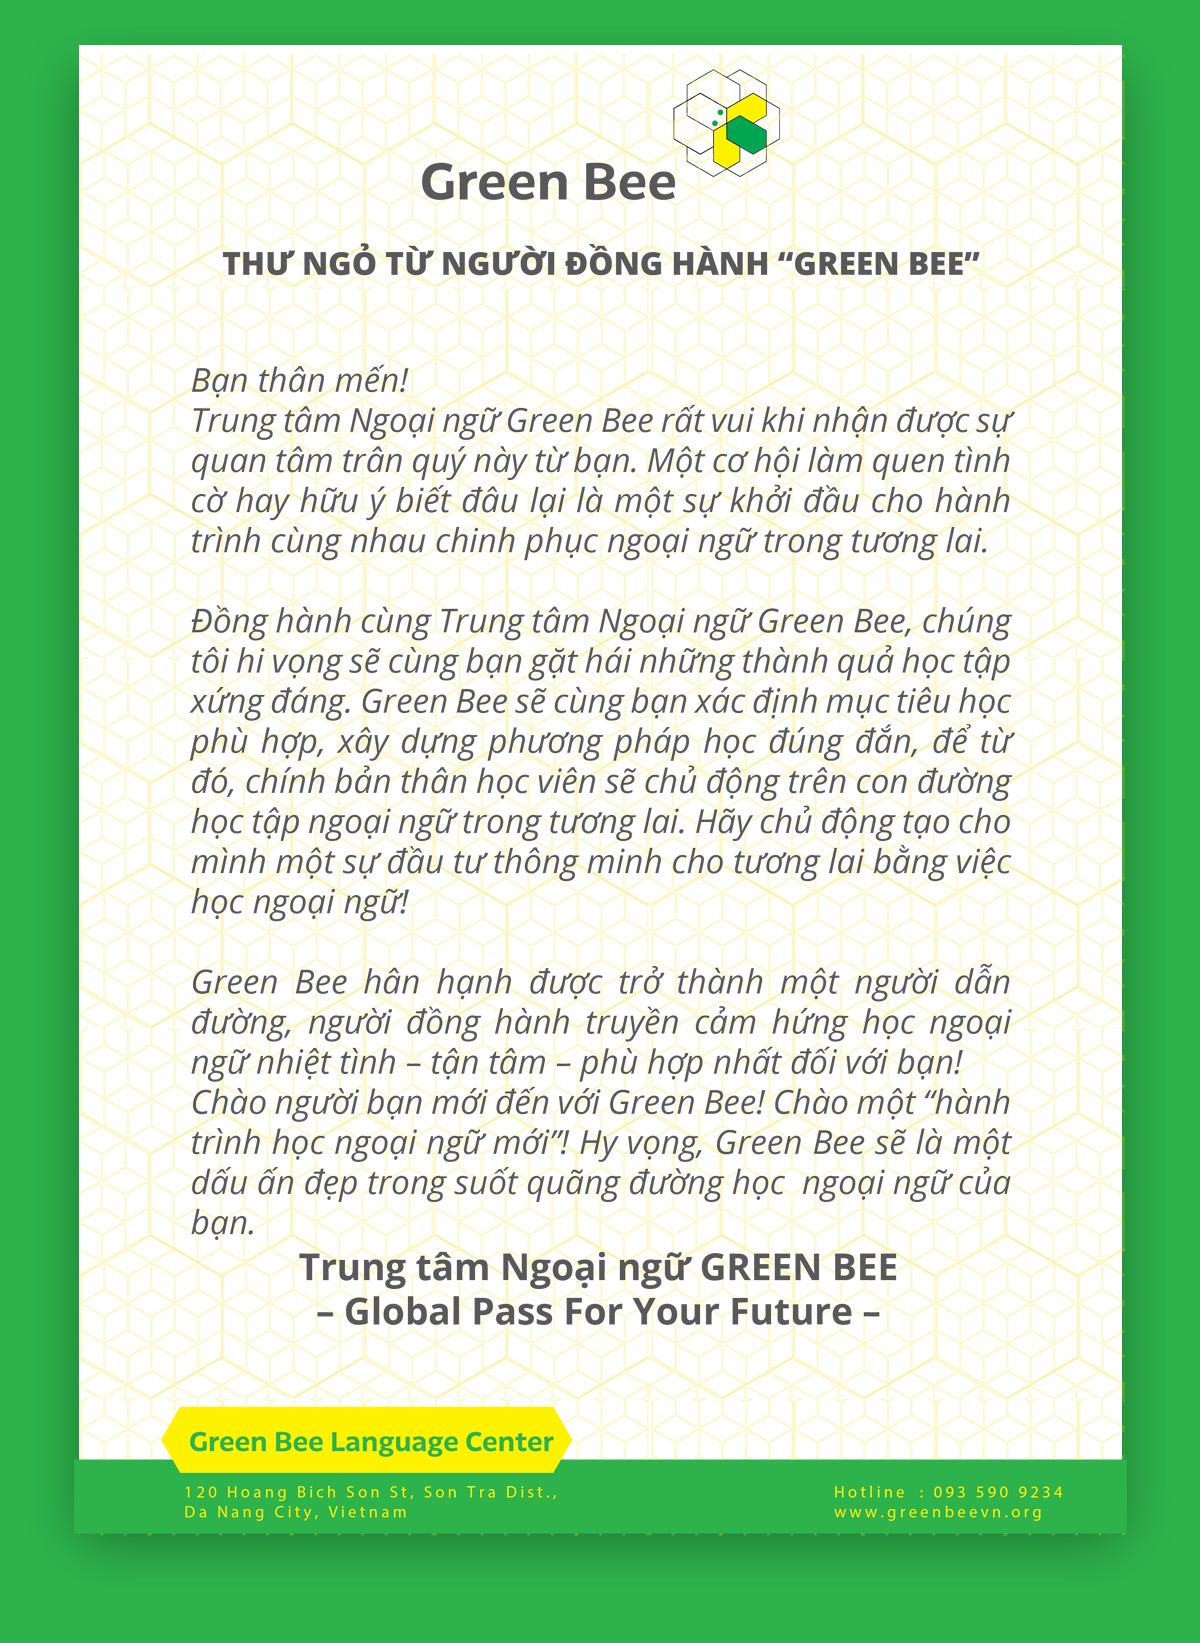 Thiết Kế Sổ Tay Anh Ngữ Green Bee 10